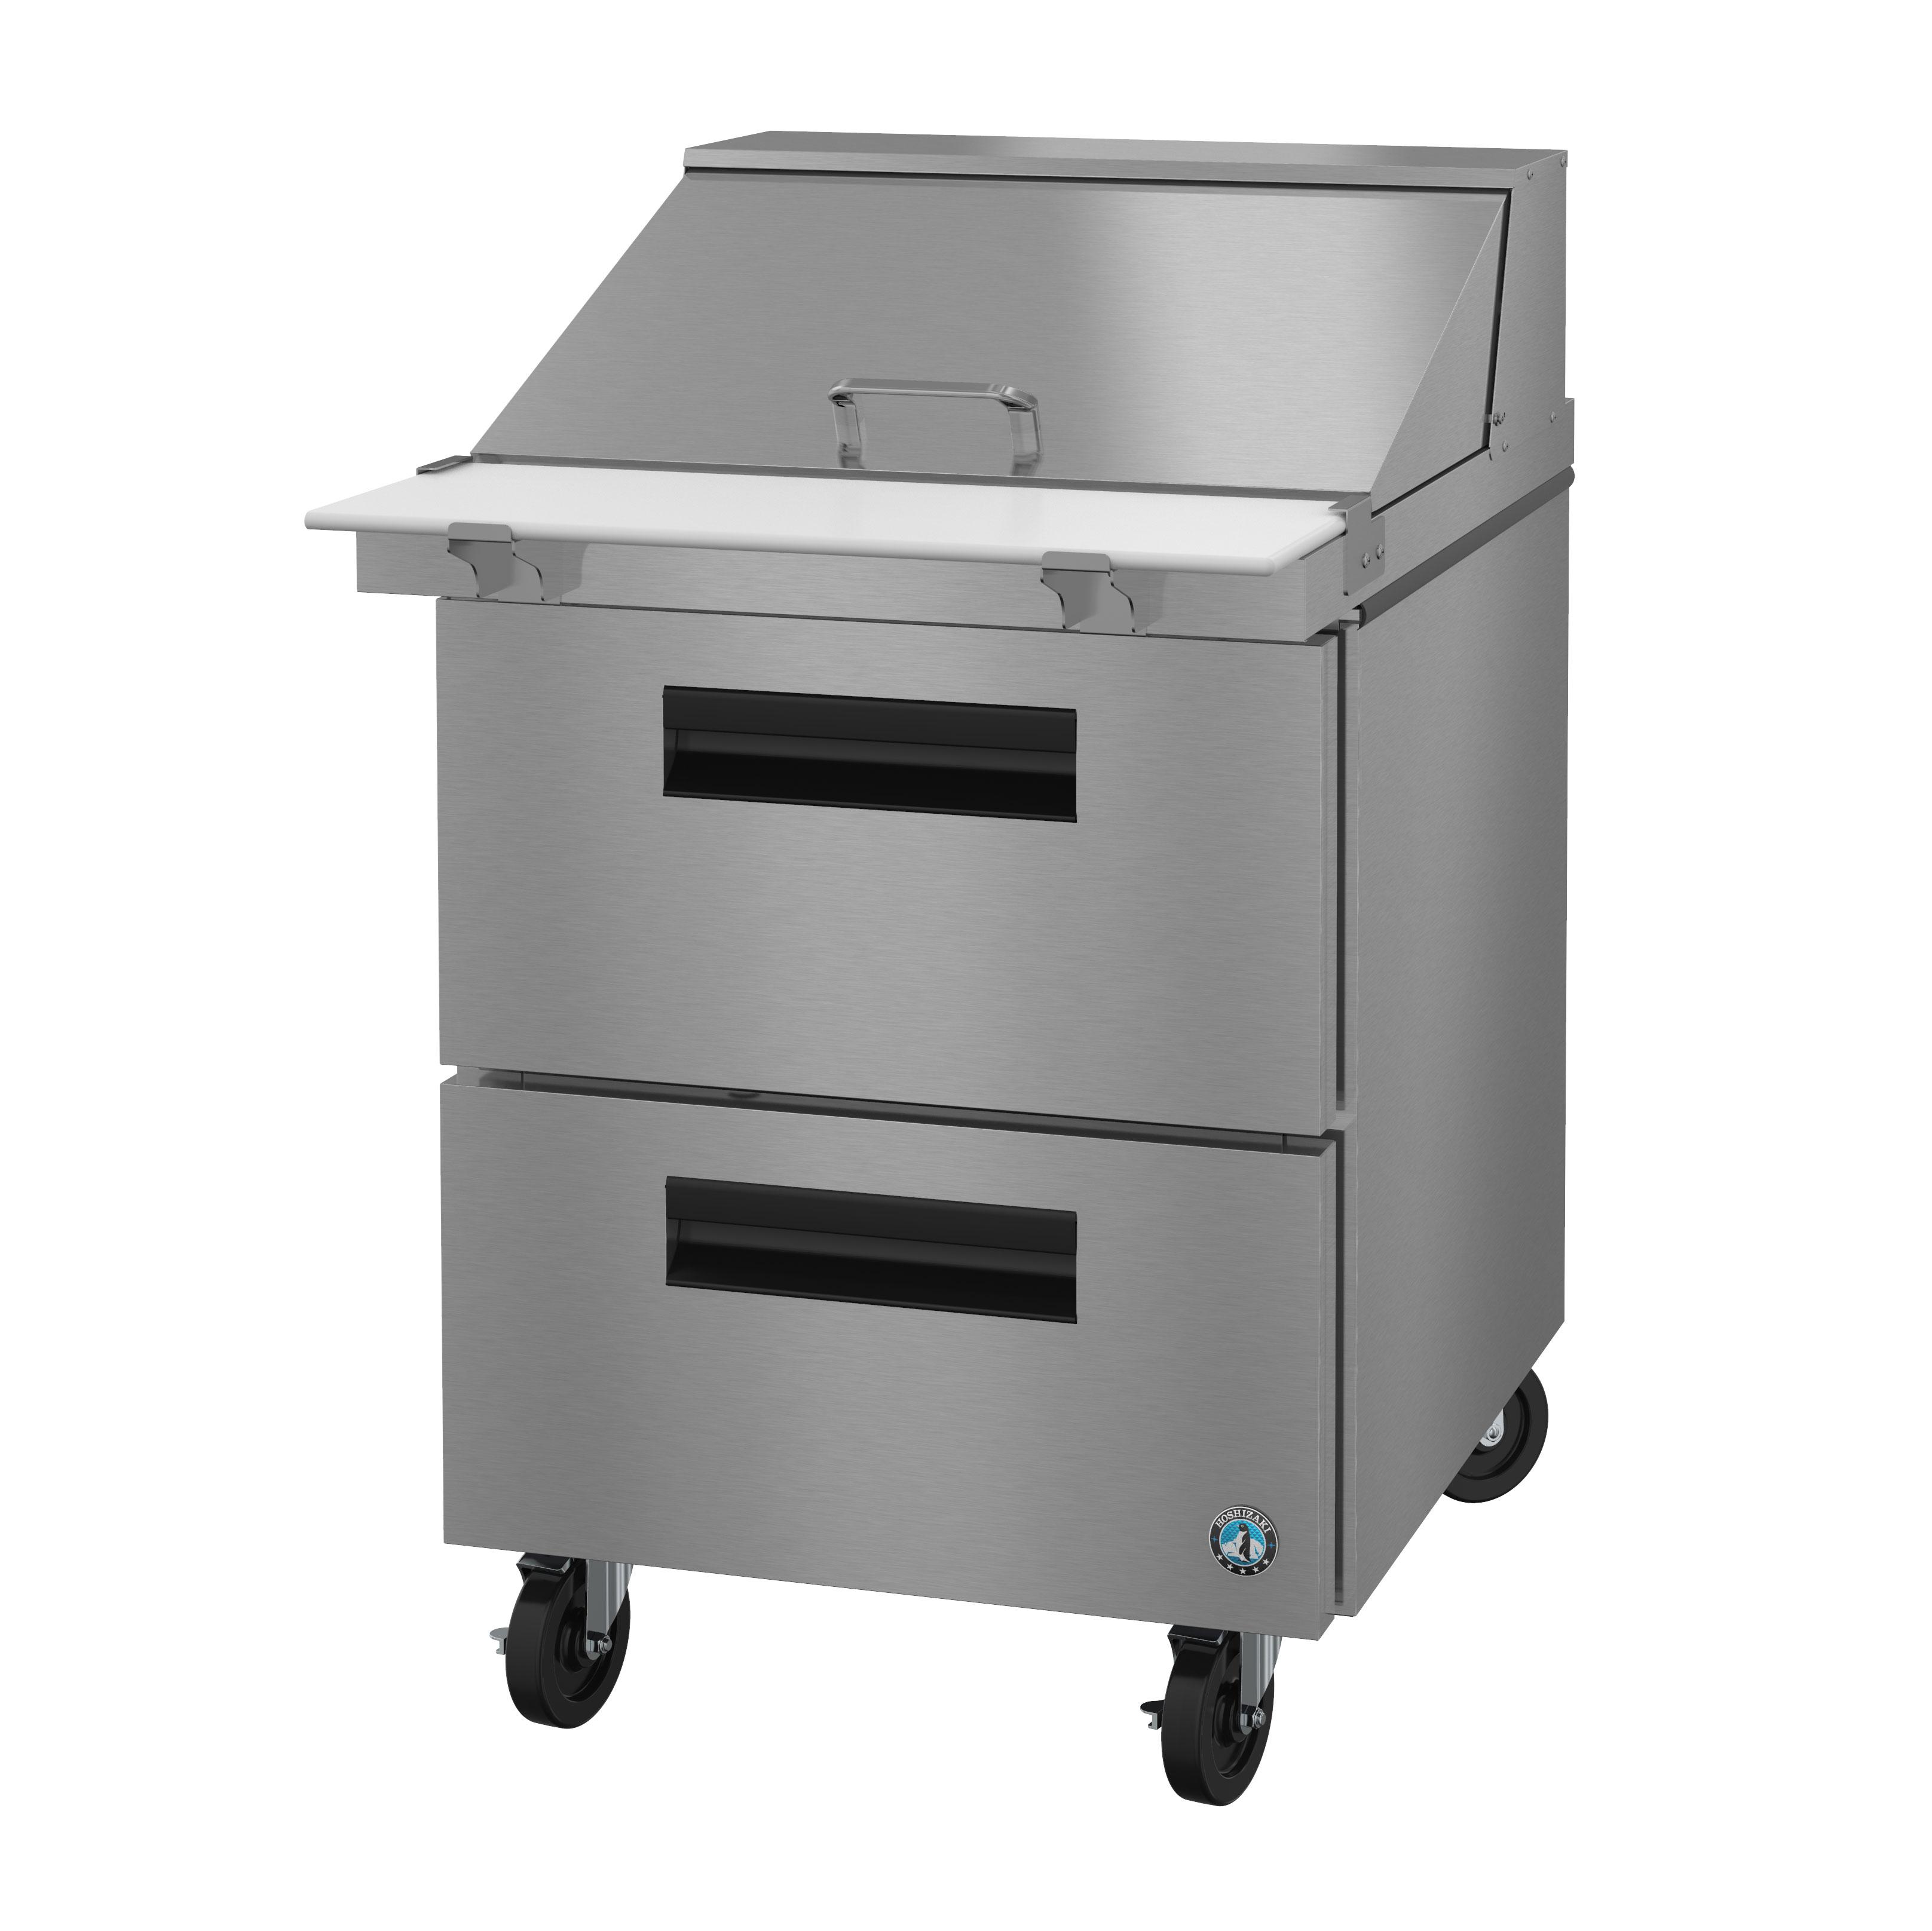 Hoshizaki SR27A-12MD2 refrigerated counter, mega top sandwich / salad unit